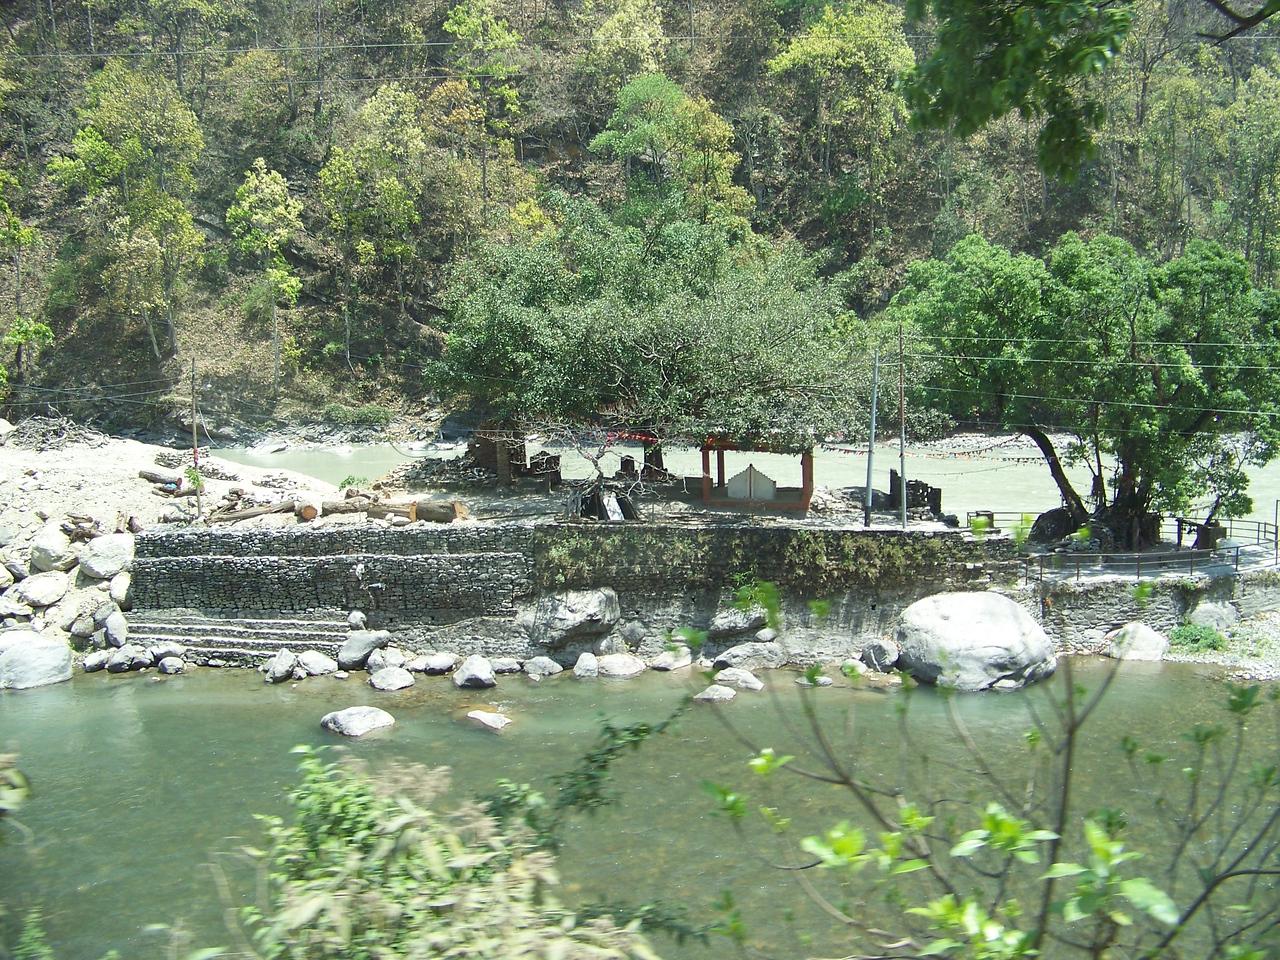 0663 - Bhote Koshi River on Araniko Highway Between Kodari and Kathmandu - Andheri Shidhupalchowk Nepal.JPG